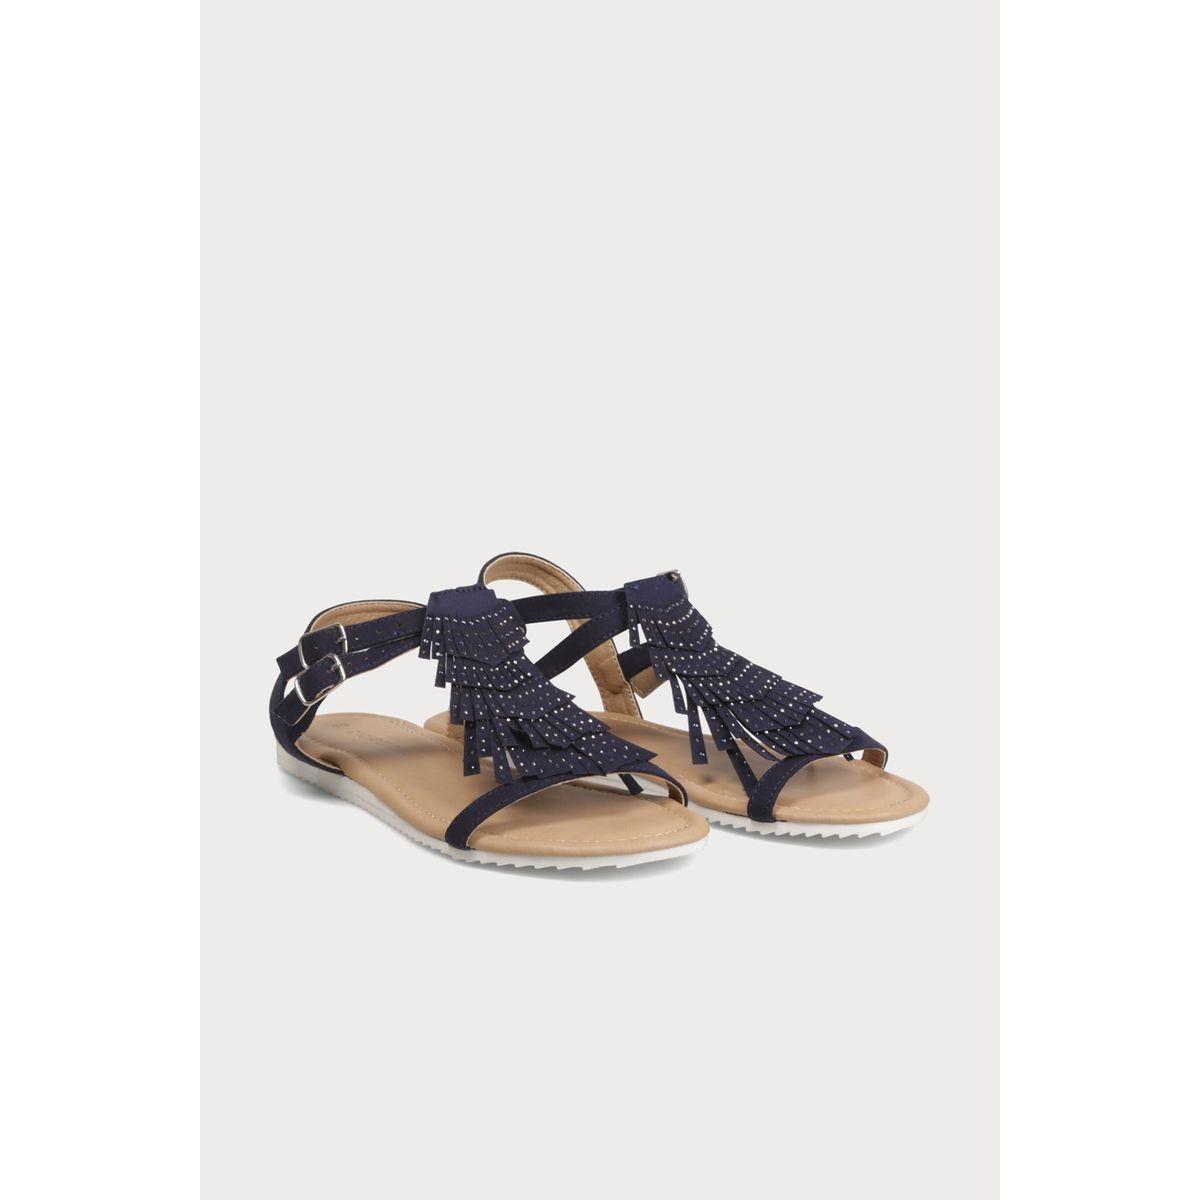 Sandales franges mexicaines